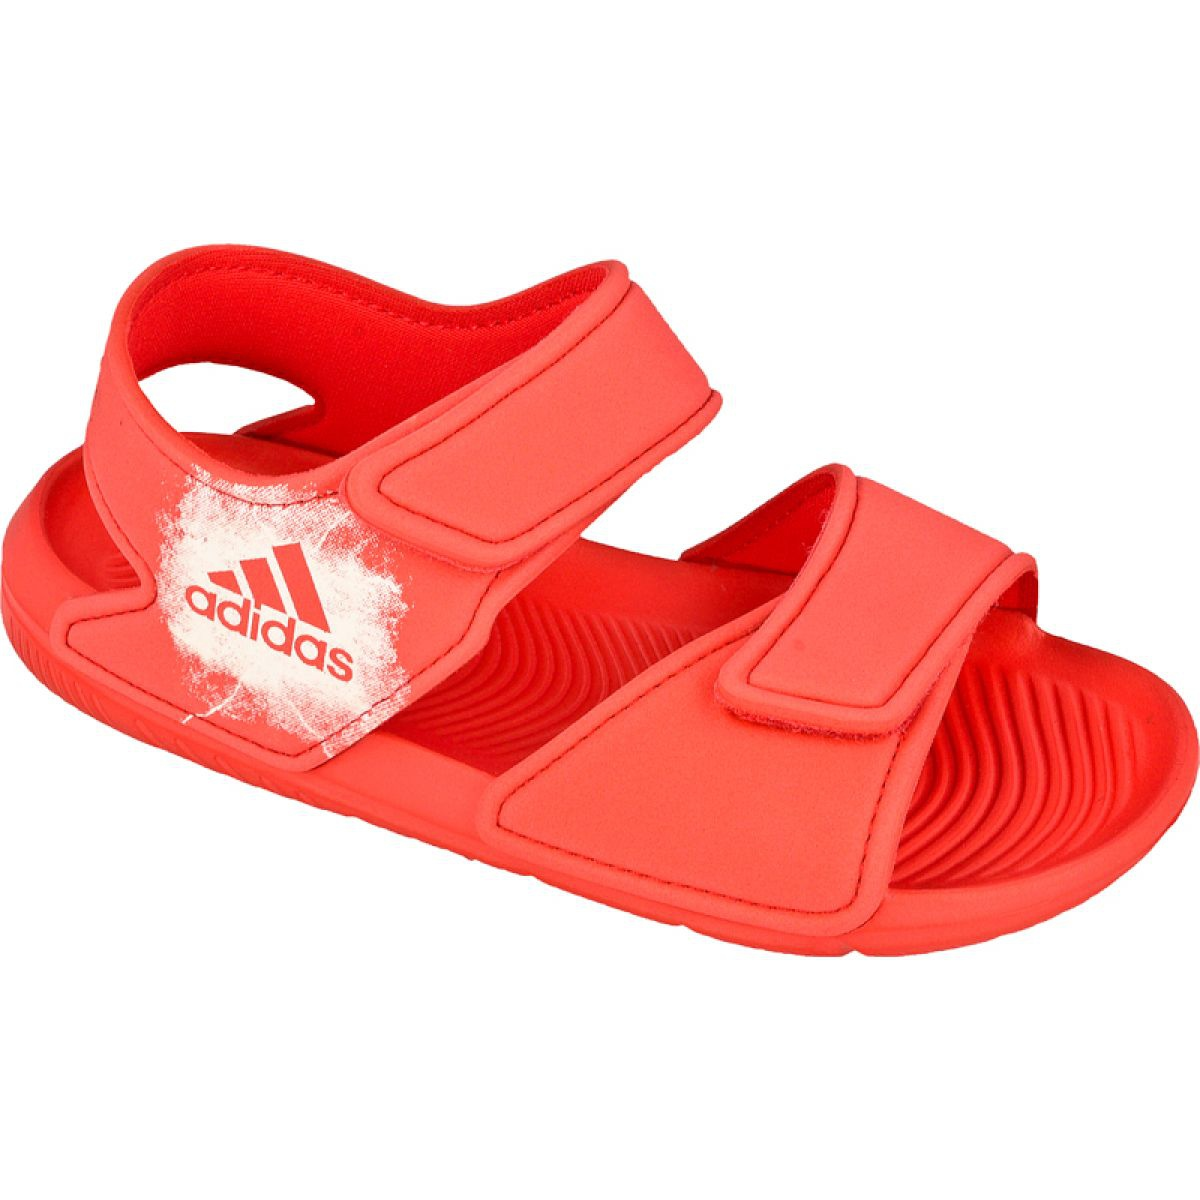 Details about Pink Adidas AltaSwim Jr BA7849 sandals